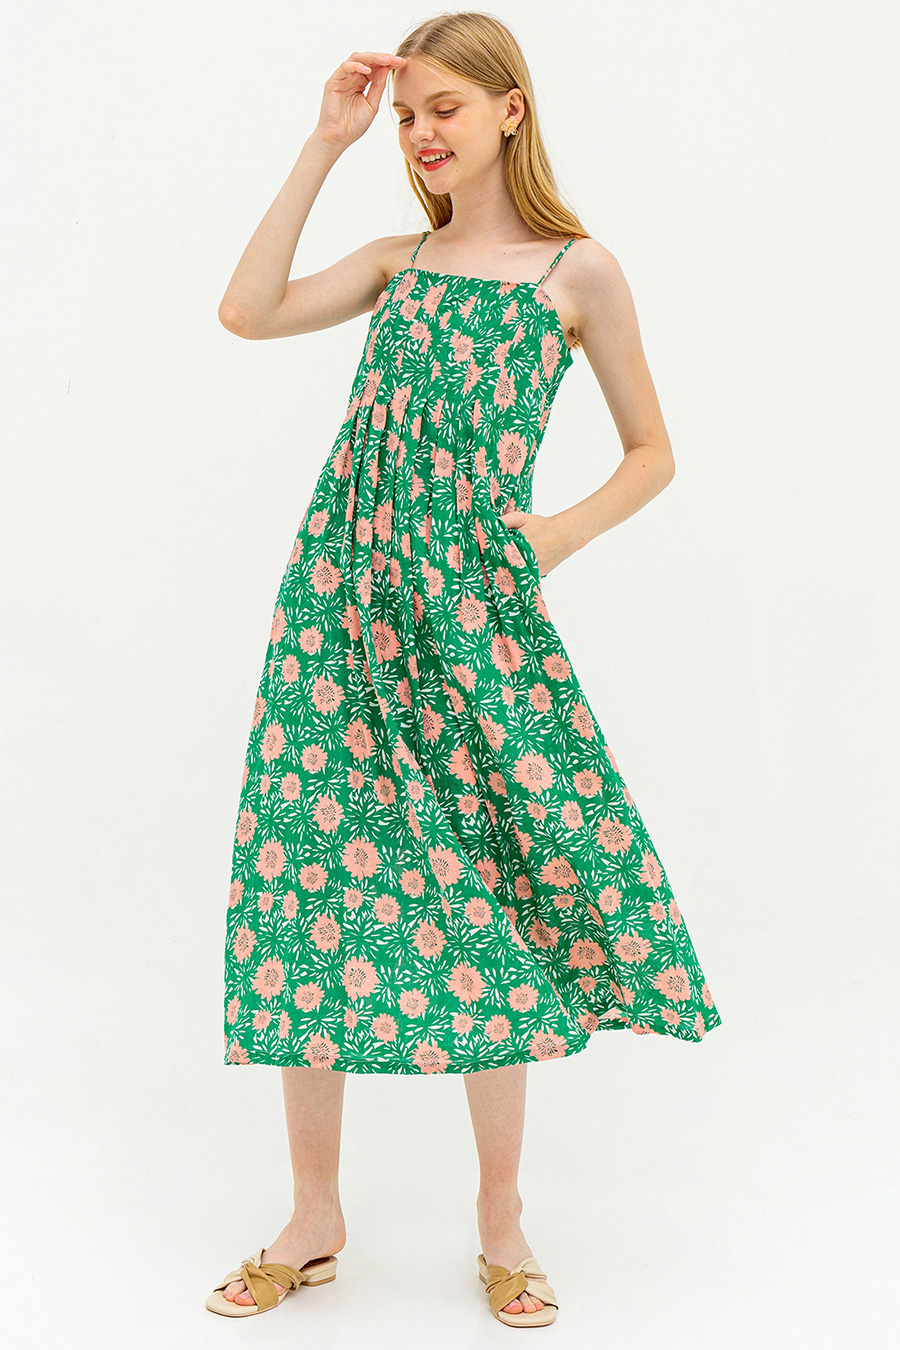 *BO* MARCELLO DRESS - SUZETTE [BY MODPARADE]